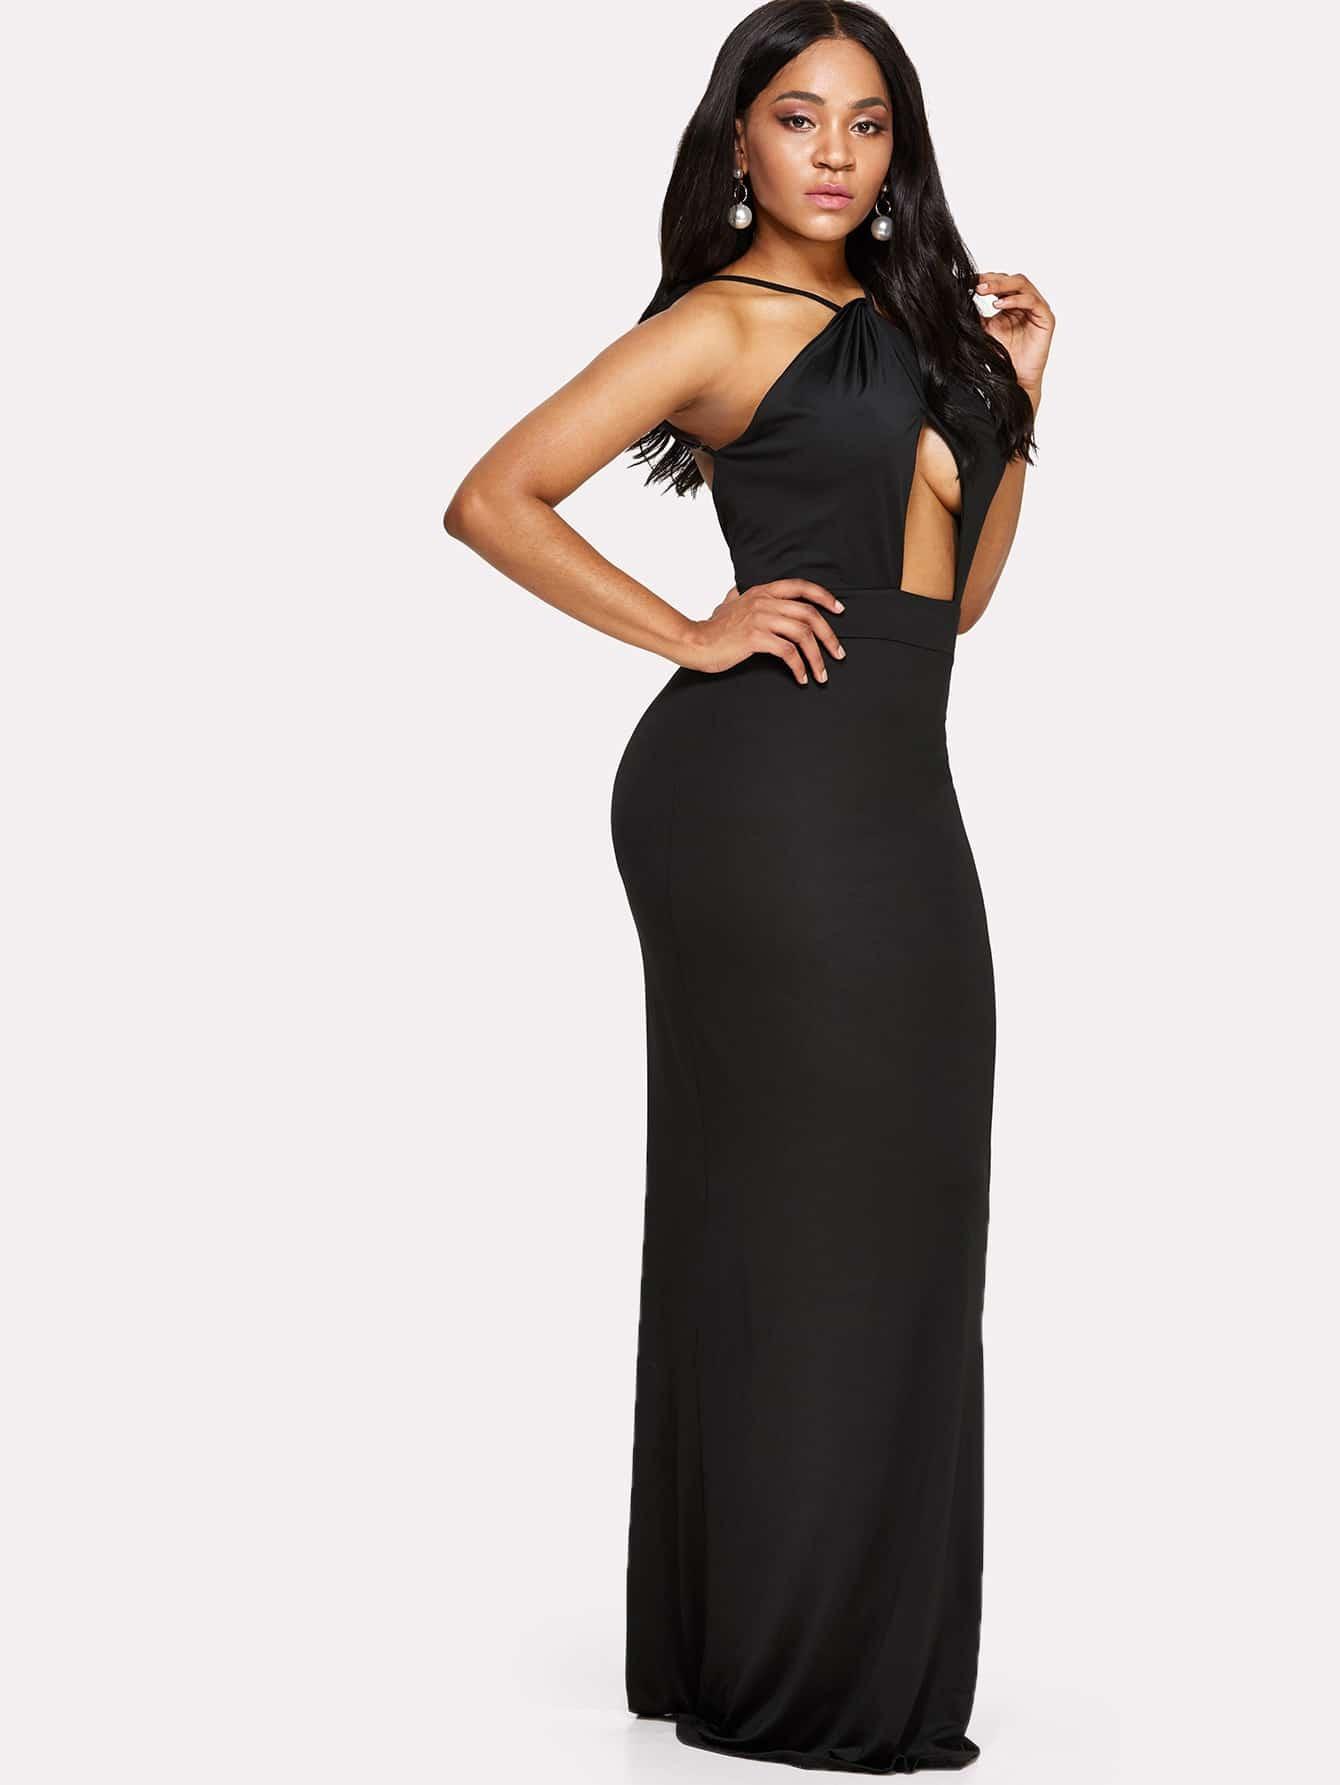 Cut Out Front Split Backless Dress cut out front split backless dress